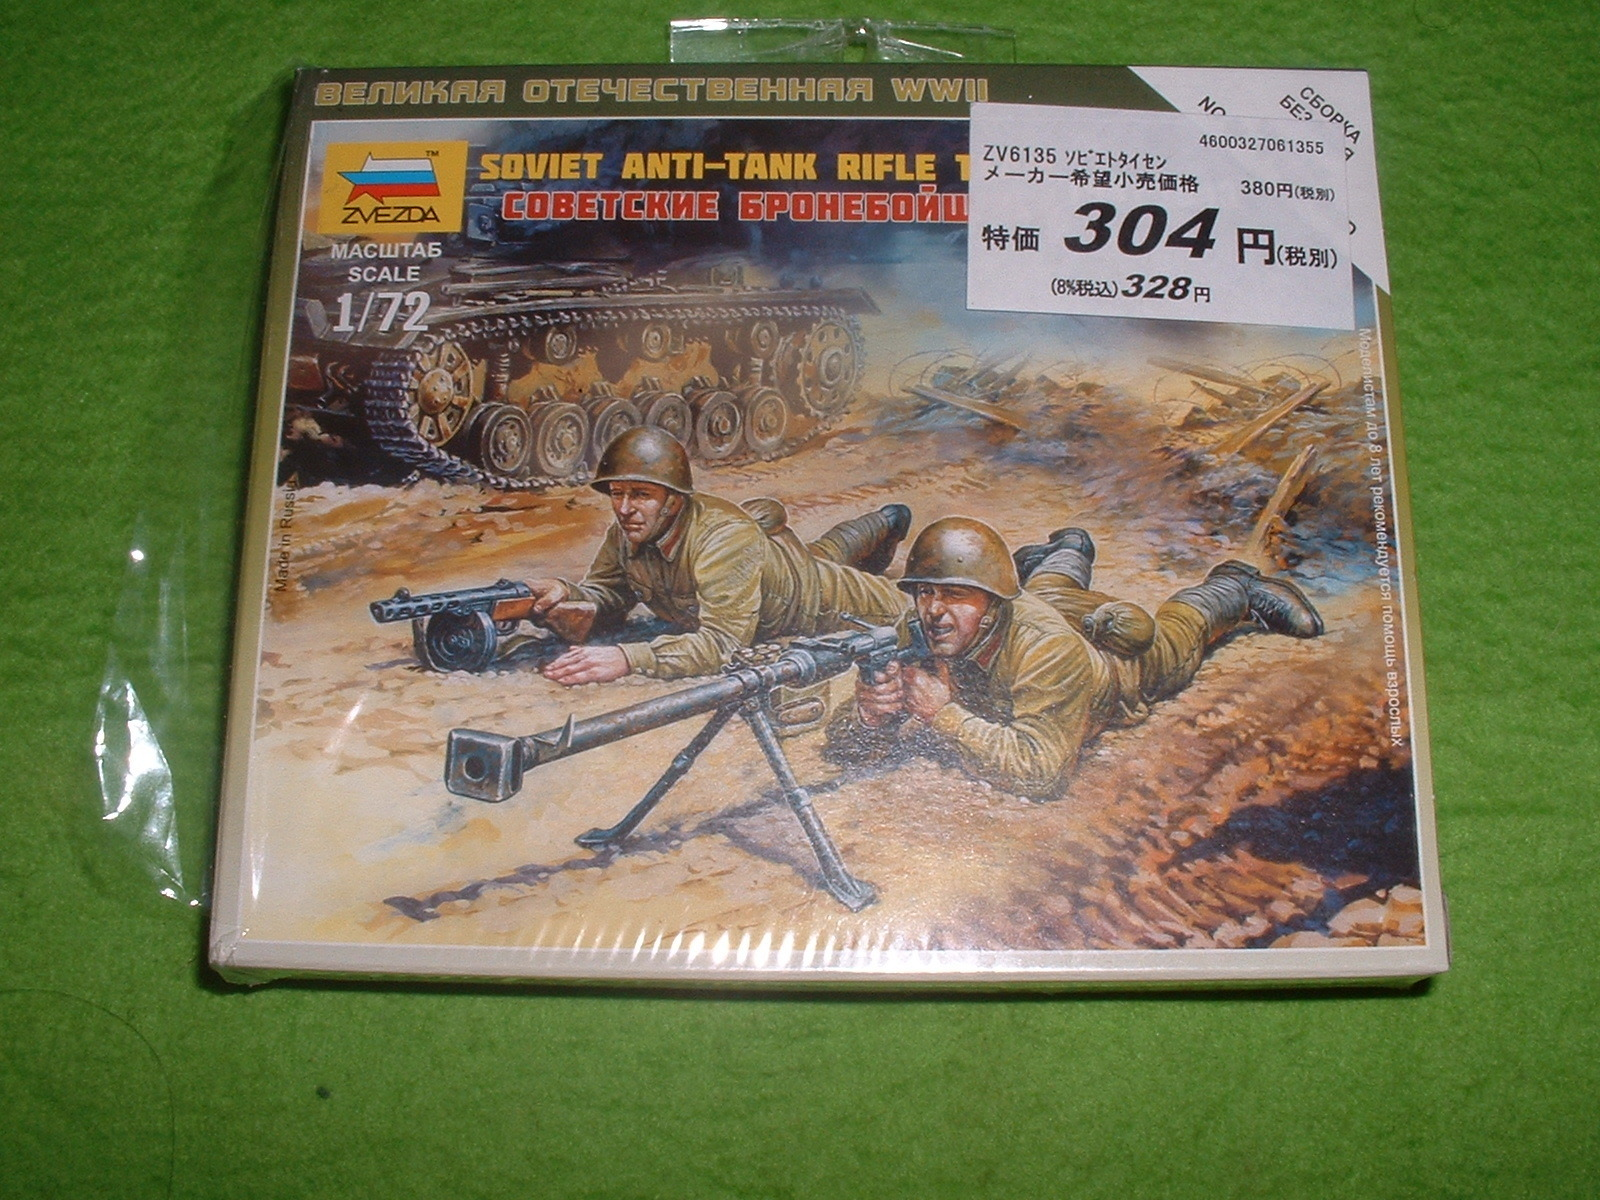 ZVEZDA  172  No6135「WW2 ソ連対戦車ライフル兵」 外箱.JPG